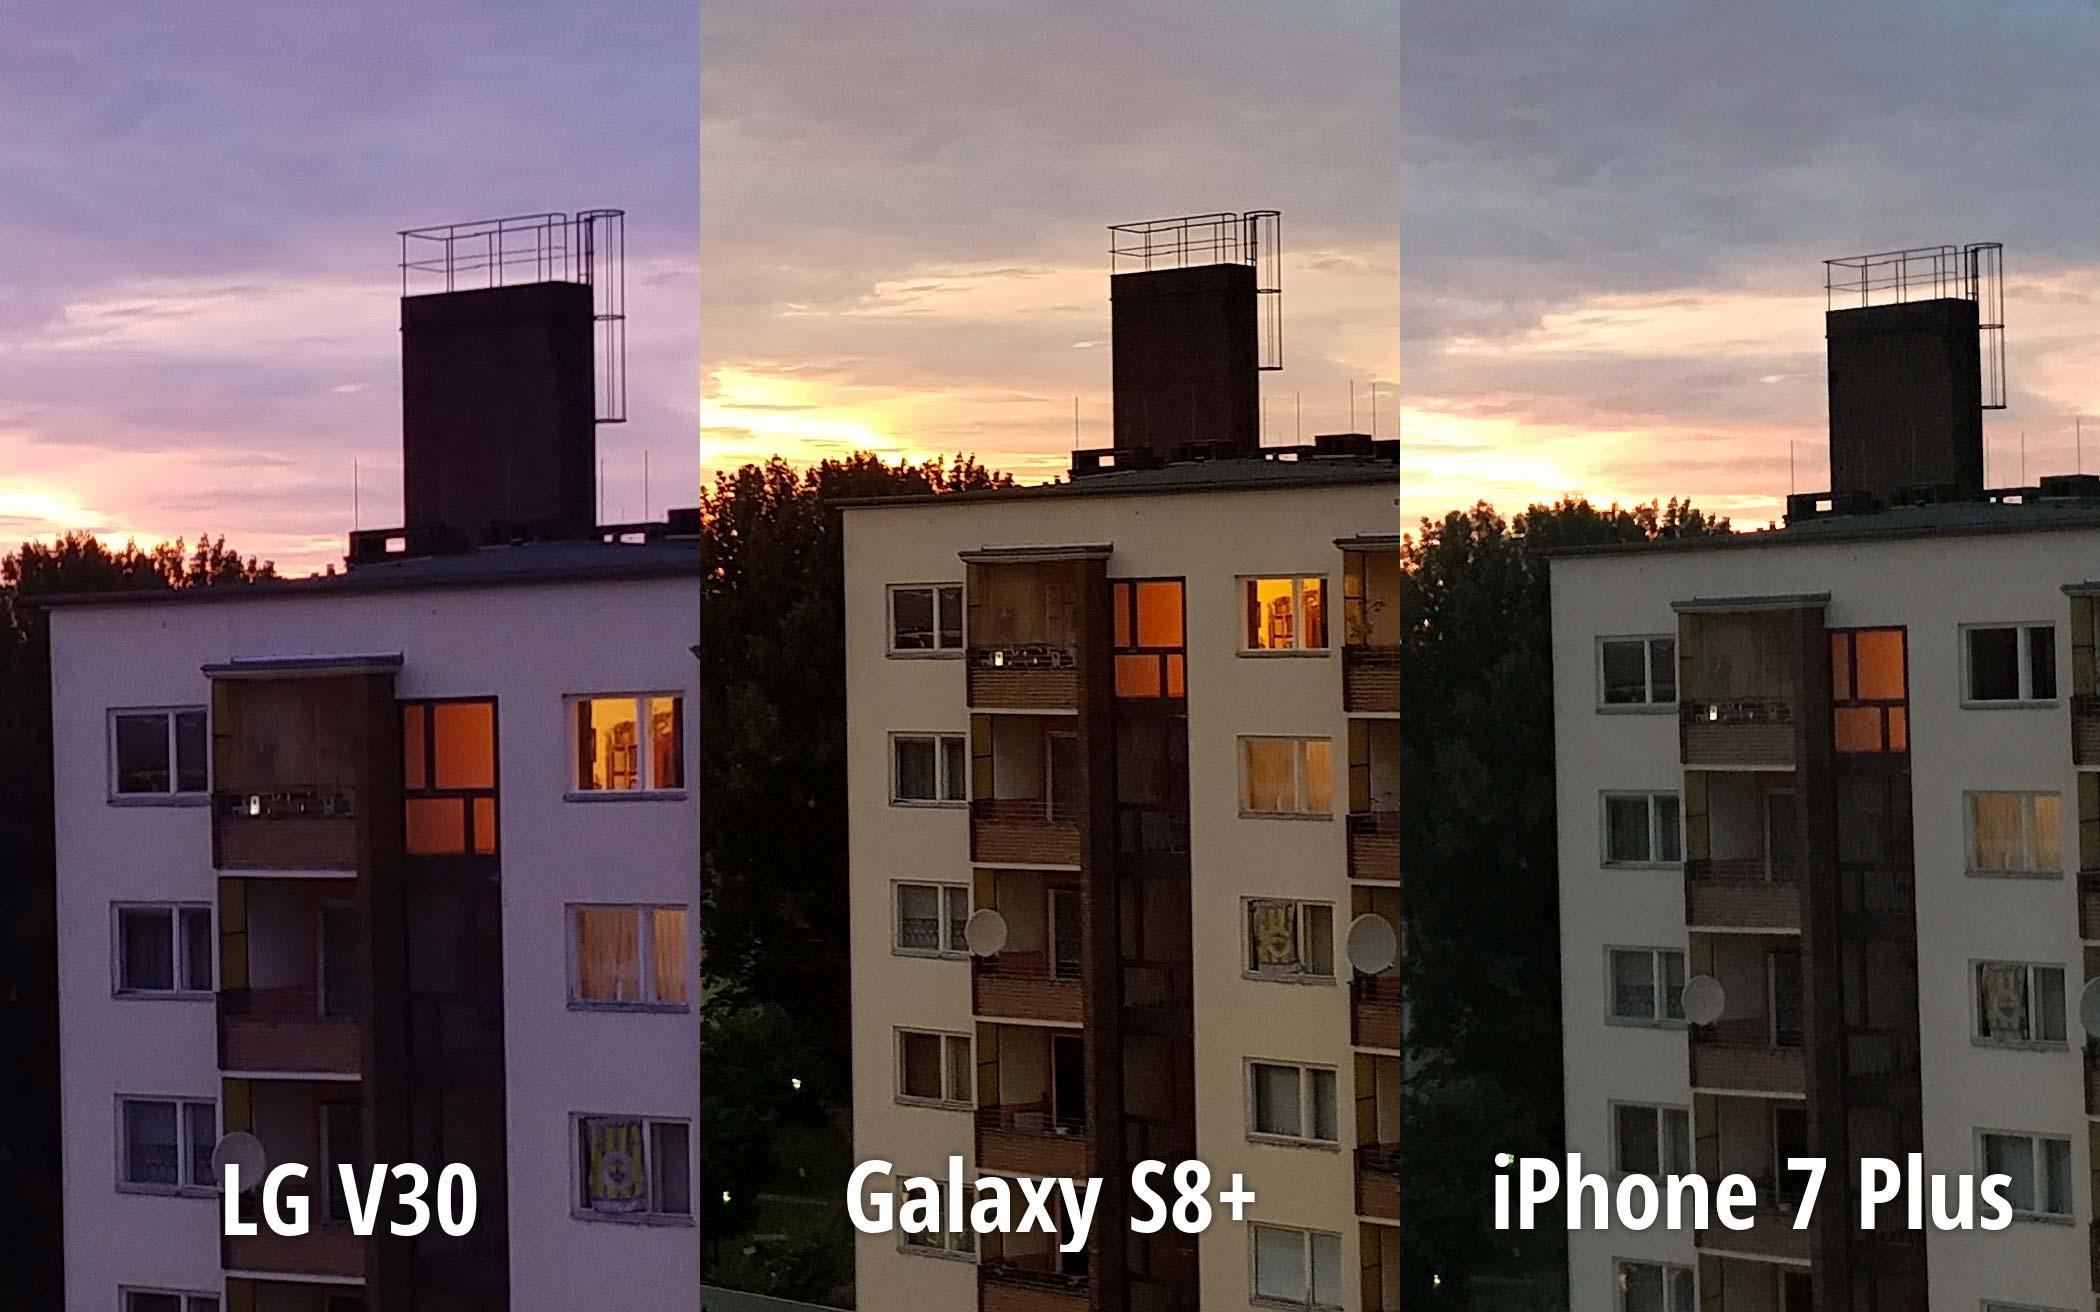 LG-V30-vs-Galaxy-S8-vs-iPhone-7-Plus-camera-photo-samples-(3).jpg